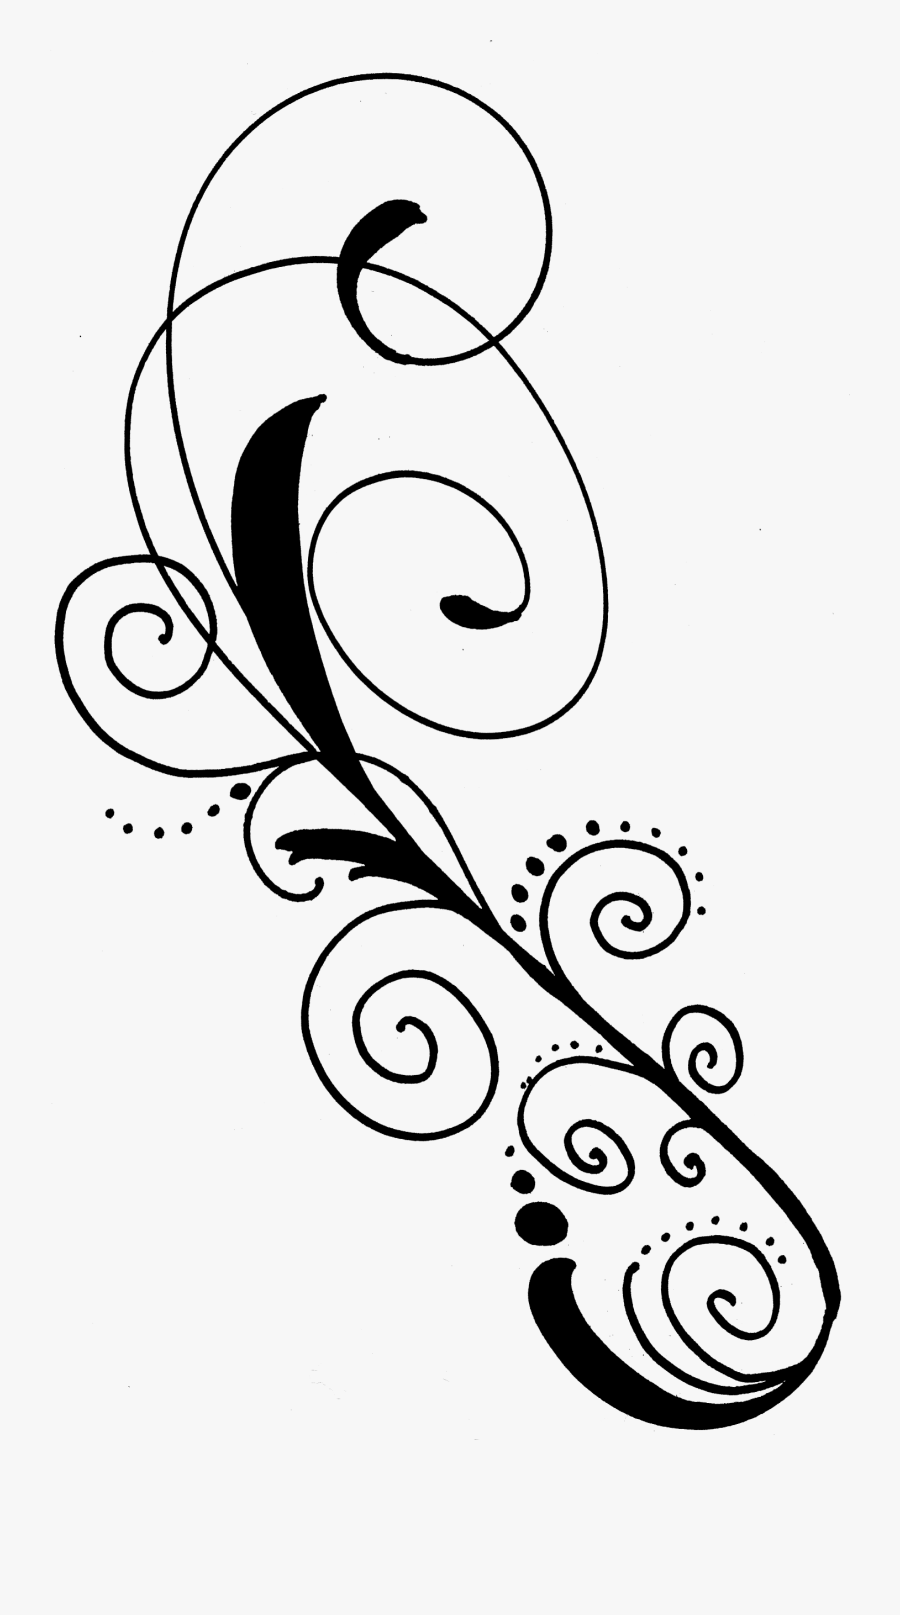 Line Clipart Black Swirl - Black Swirl Design No Background, Transparent Clipart